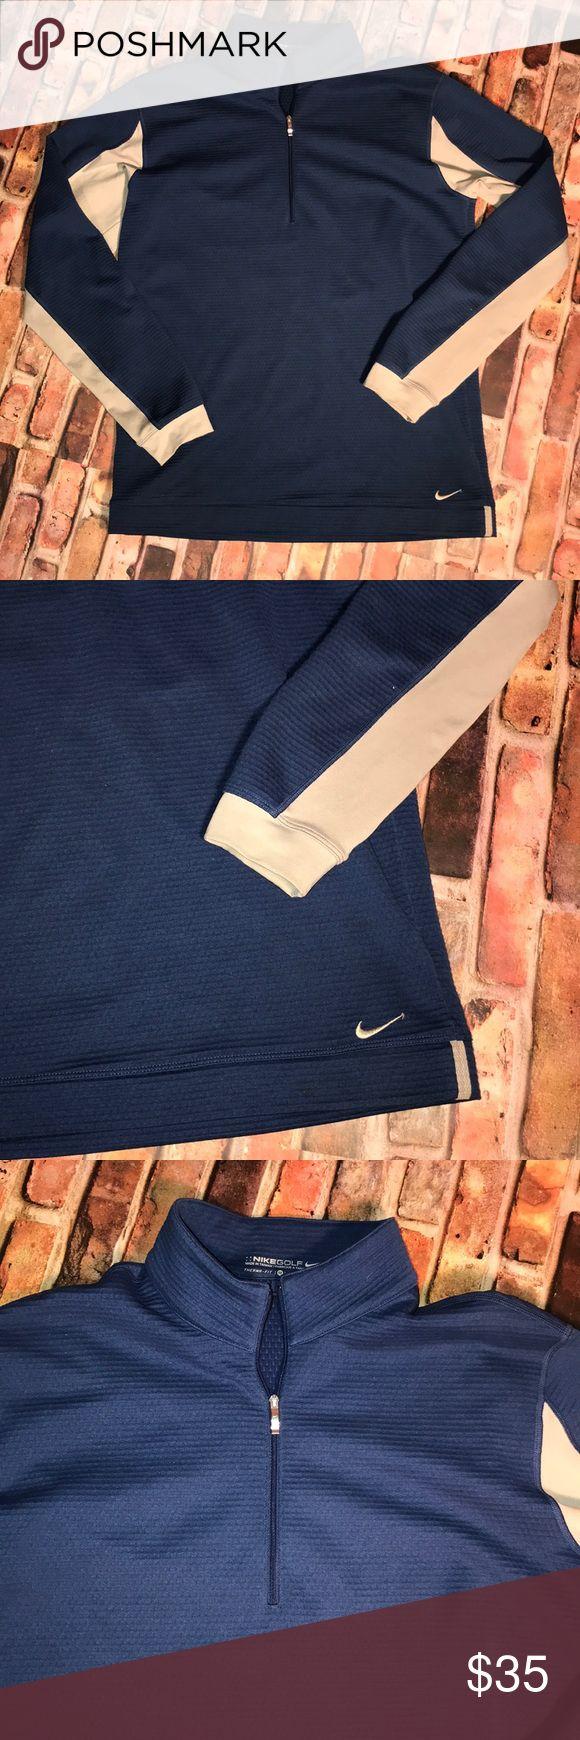 Men's Nike golf jacket (M) Men's blue and light gray Nike golf jacket therma fit size M. Nike Jackets & Coats Performance Jackets